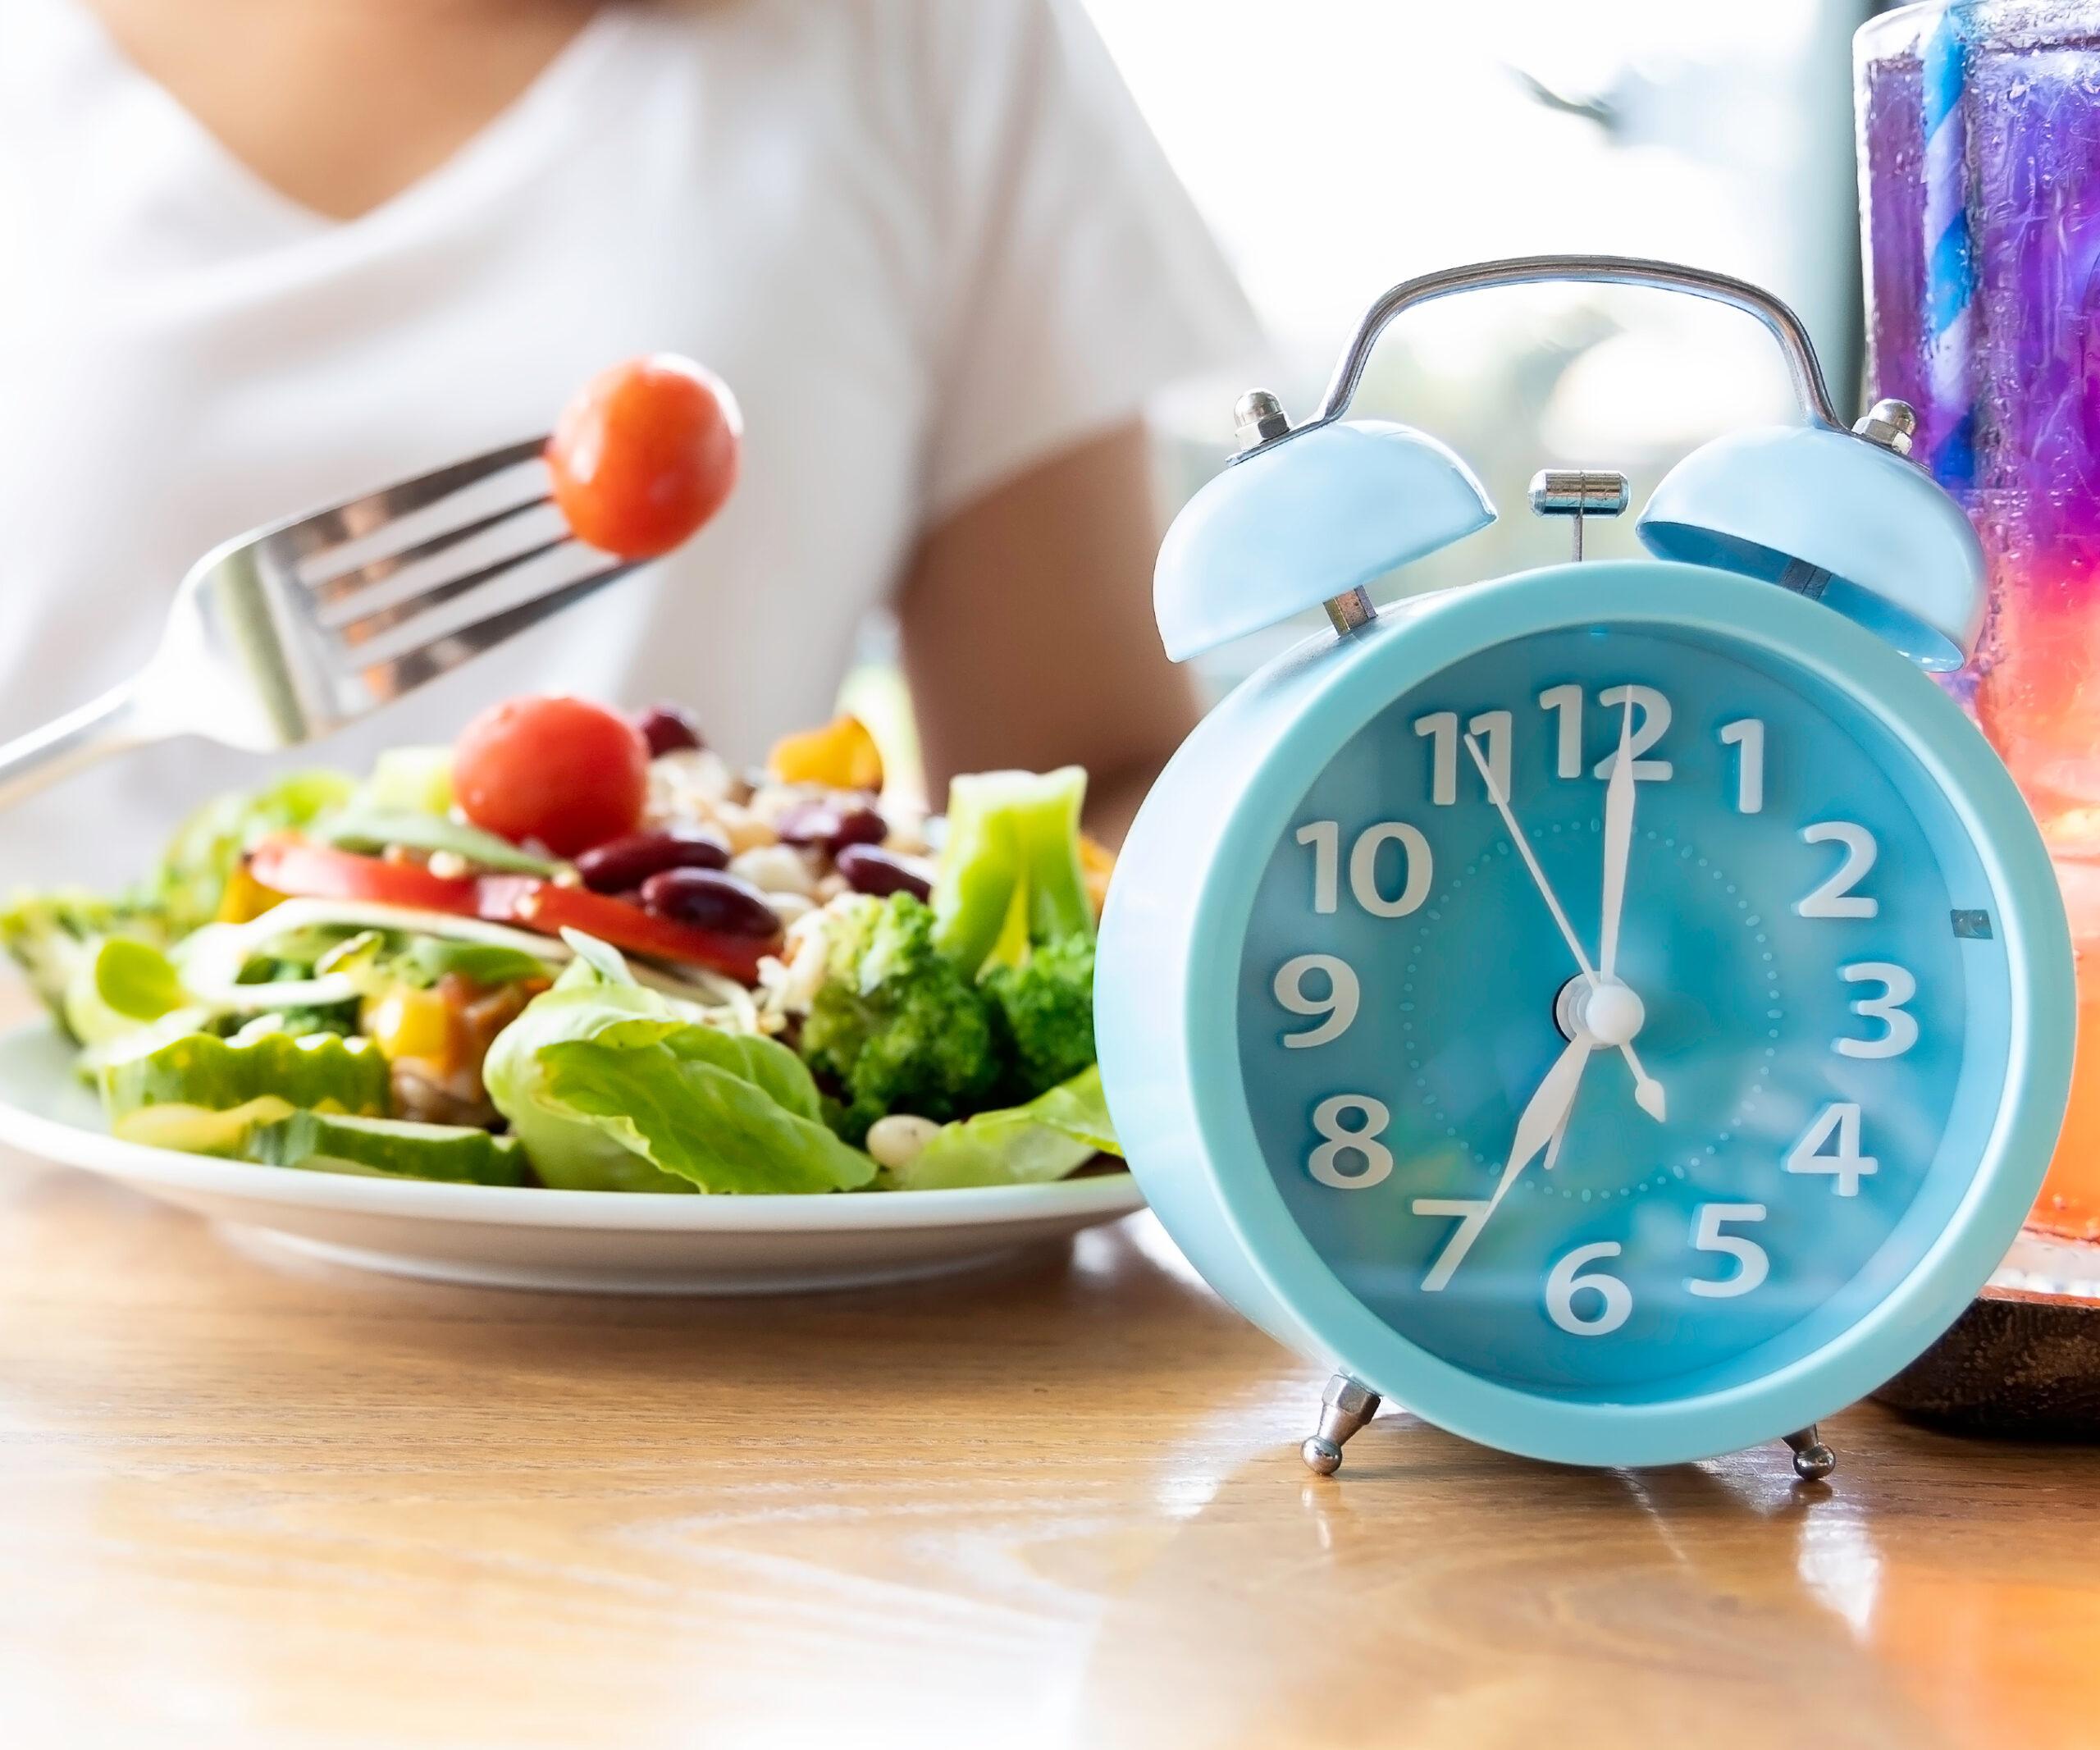 FOOD AND CLOCK